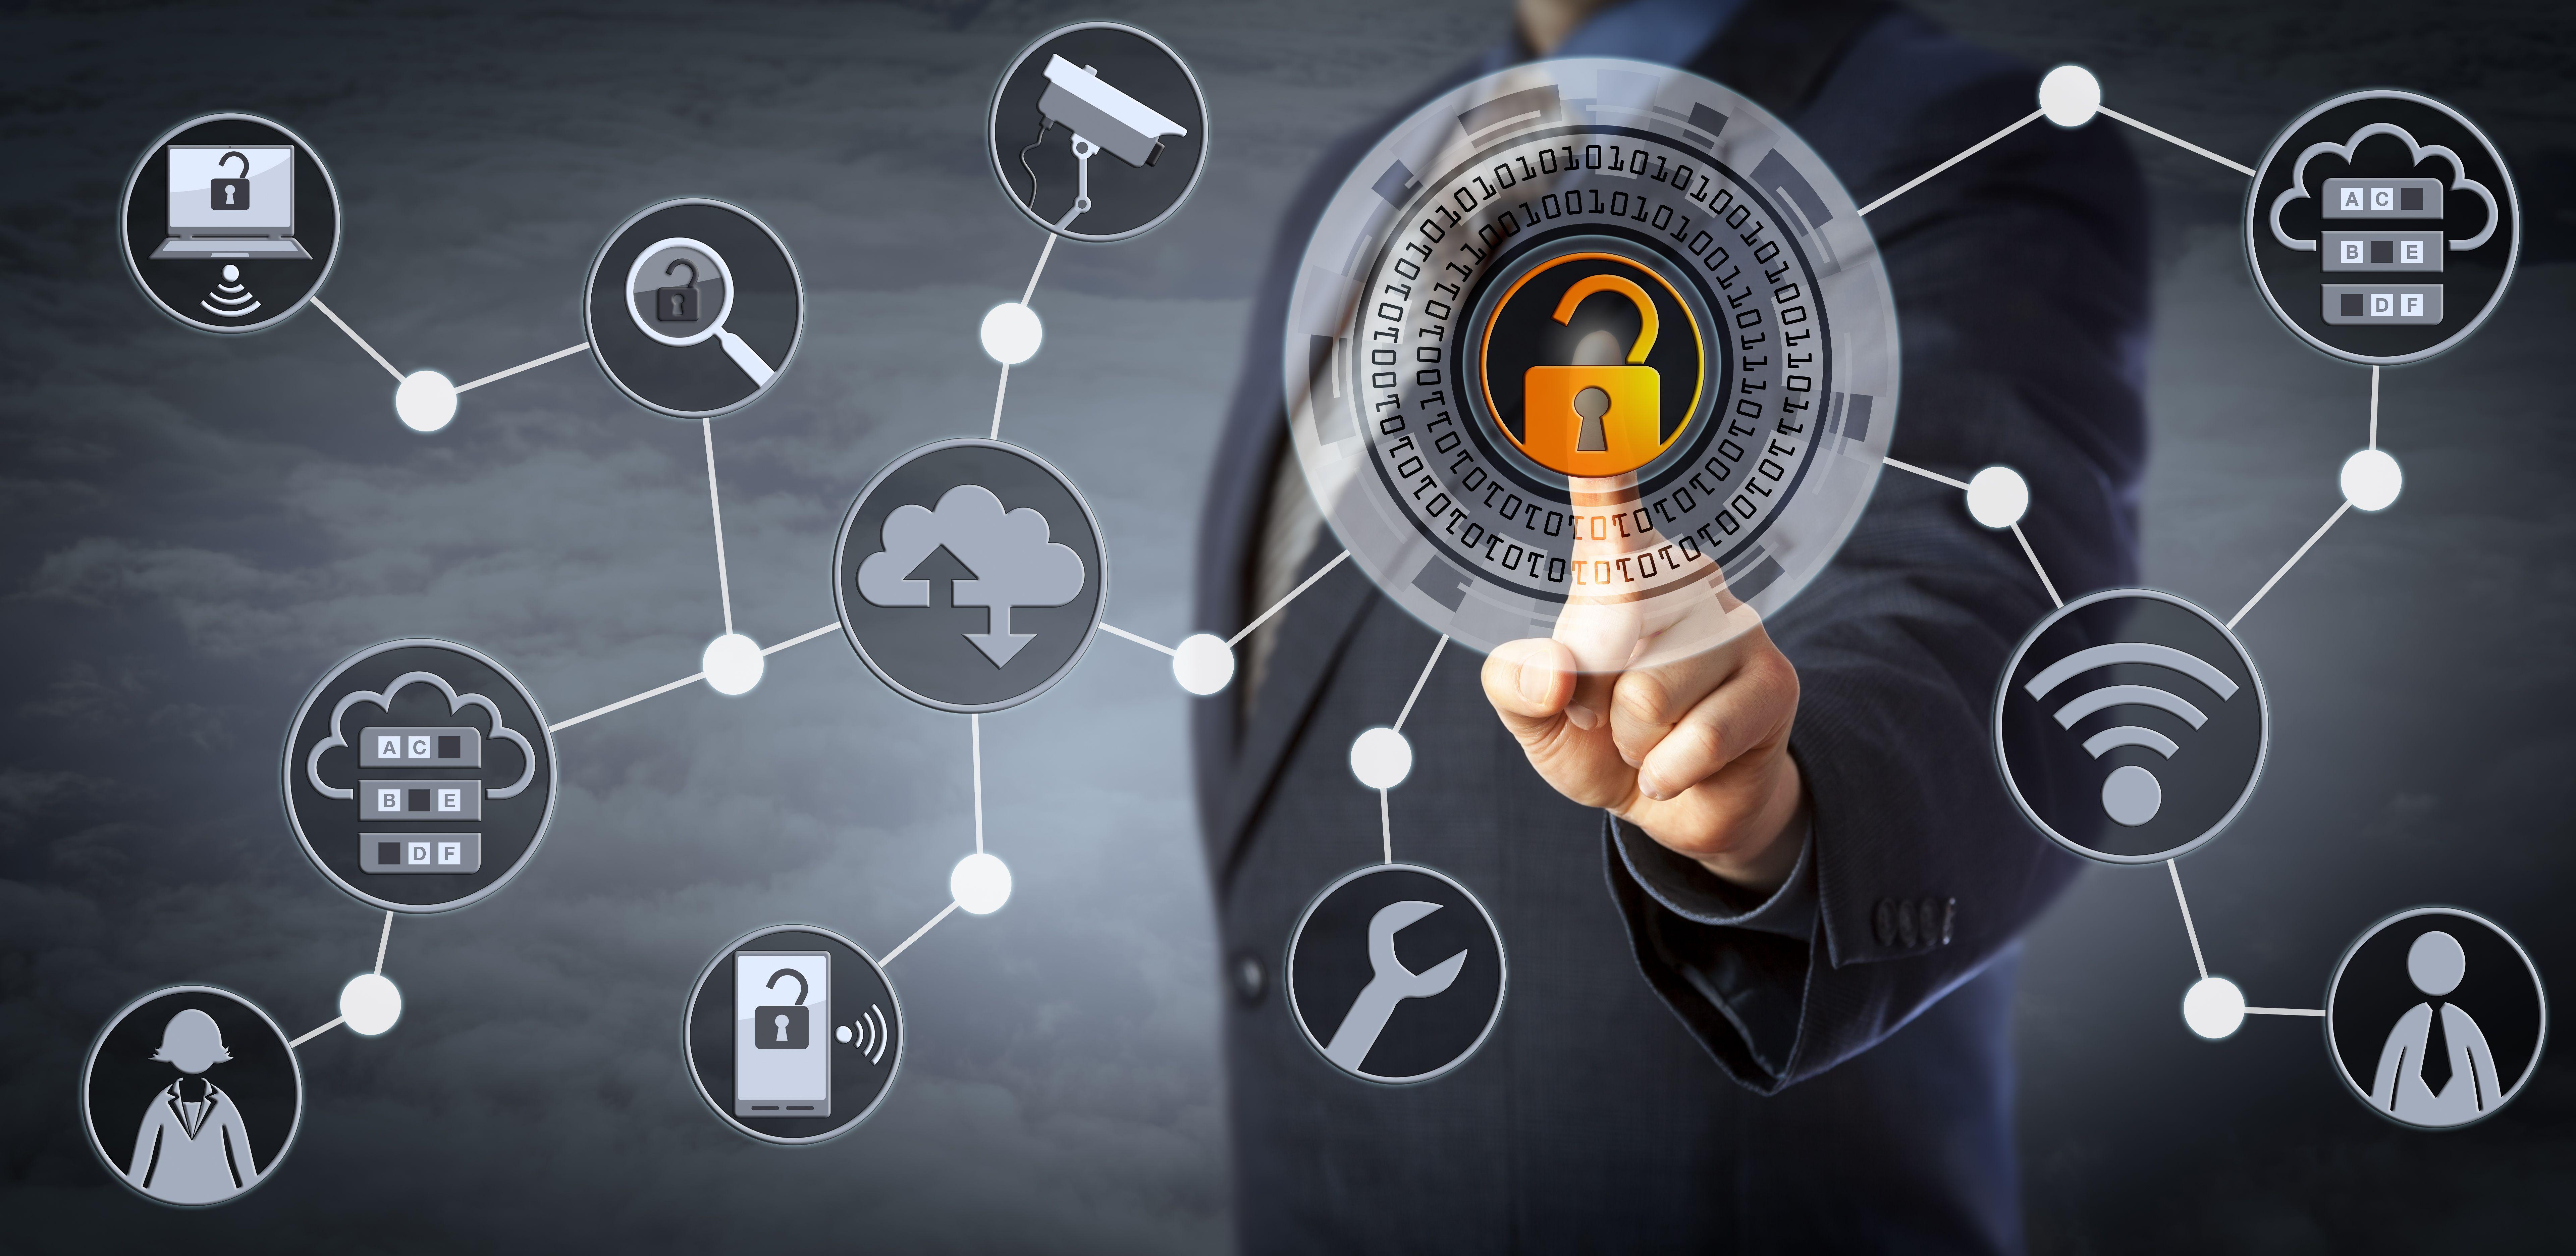 Ciberseguridad - Semantic - Systems